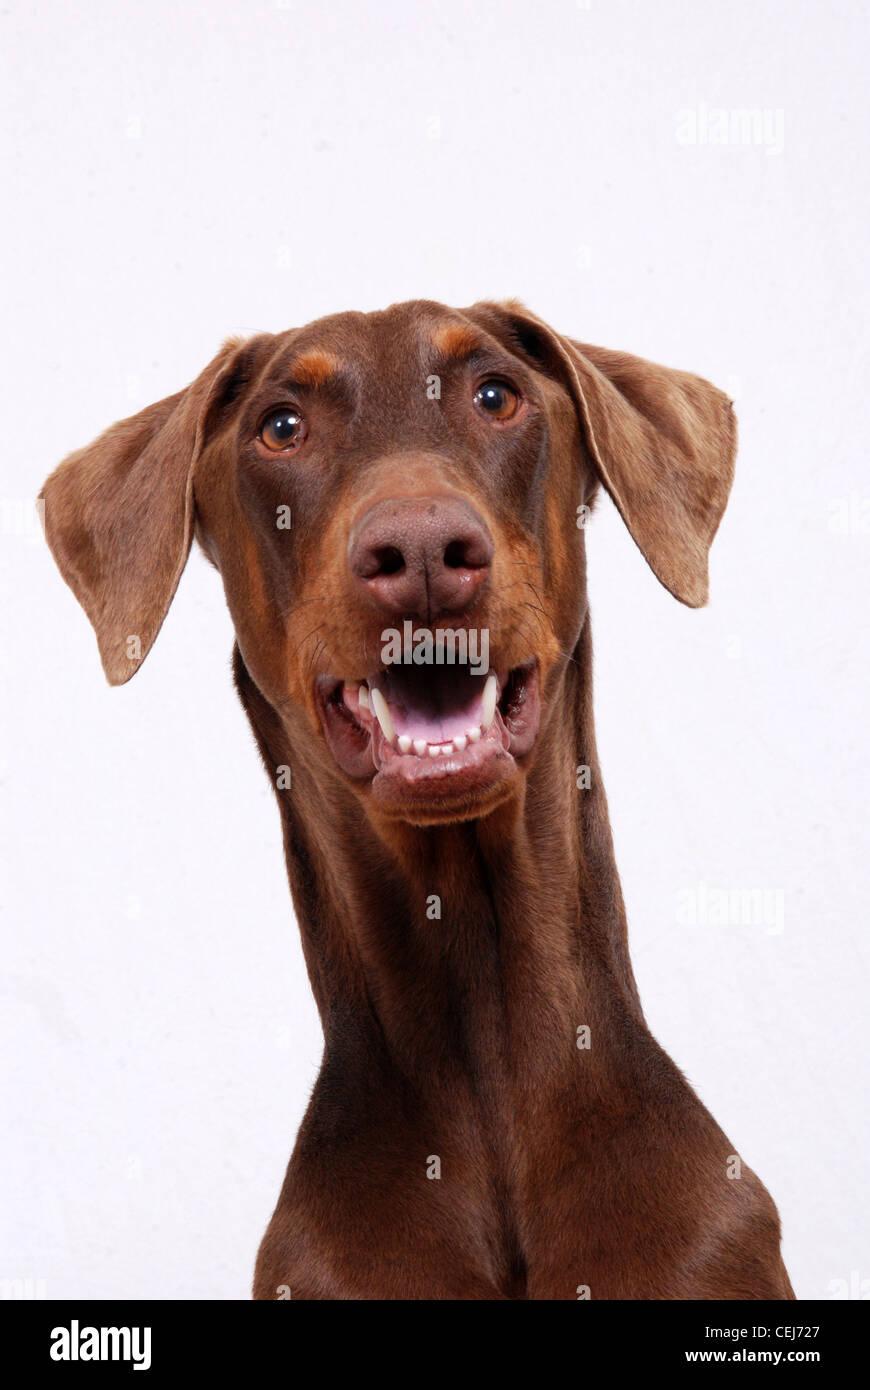 portrait of a red doberman pinscher dog stock photo 43426607 alamy